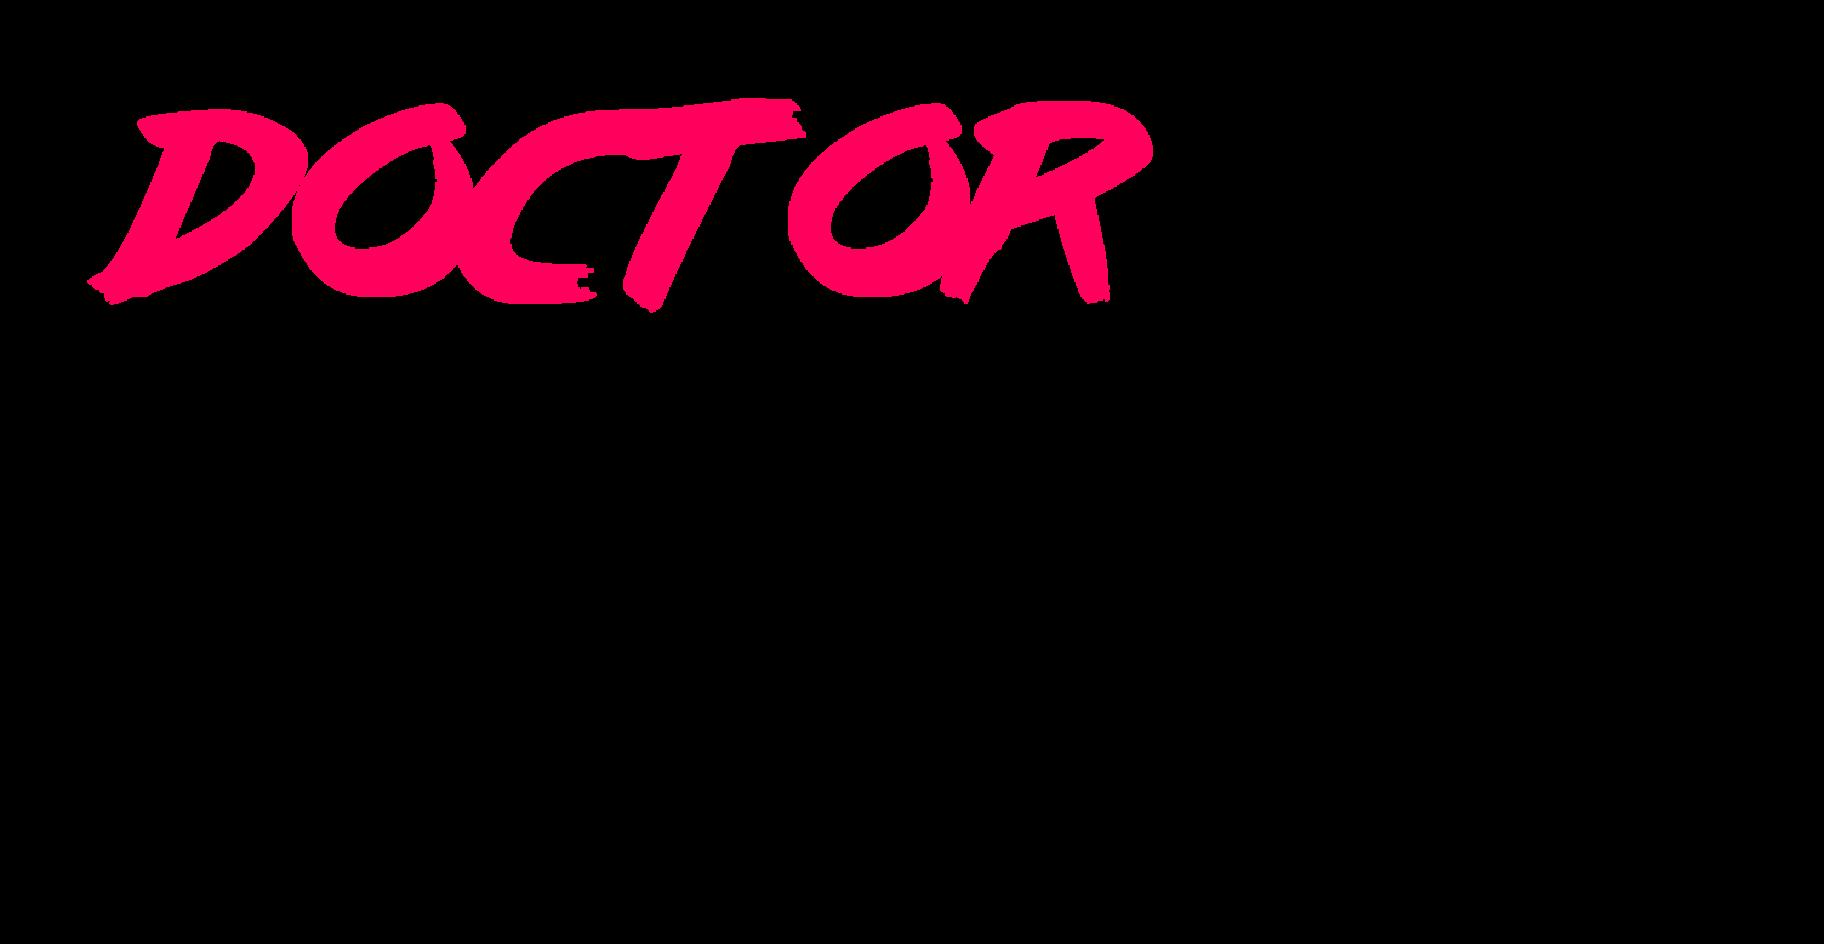 Doctorwho logo design png